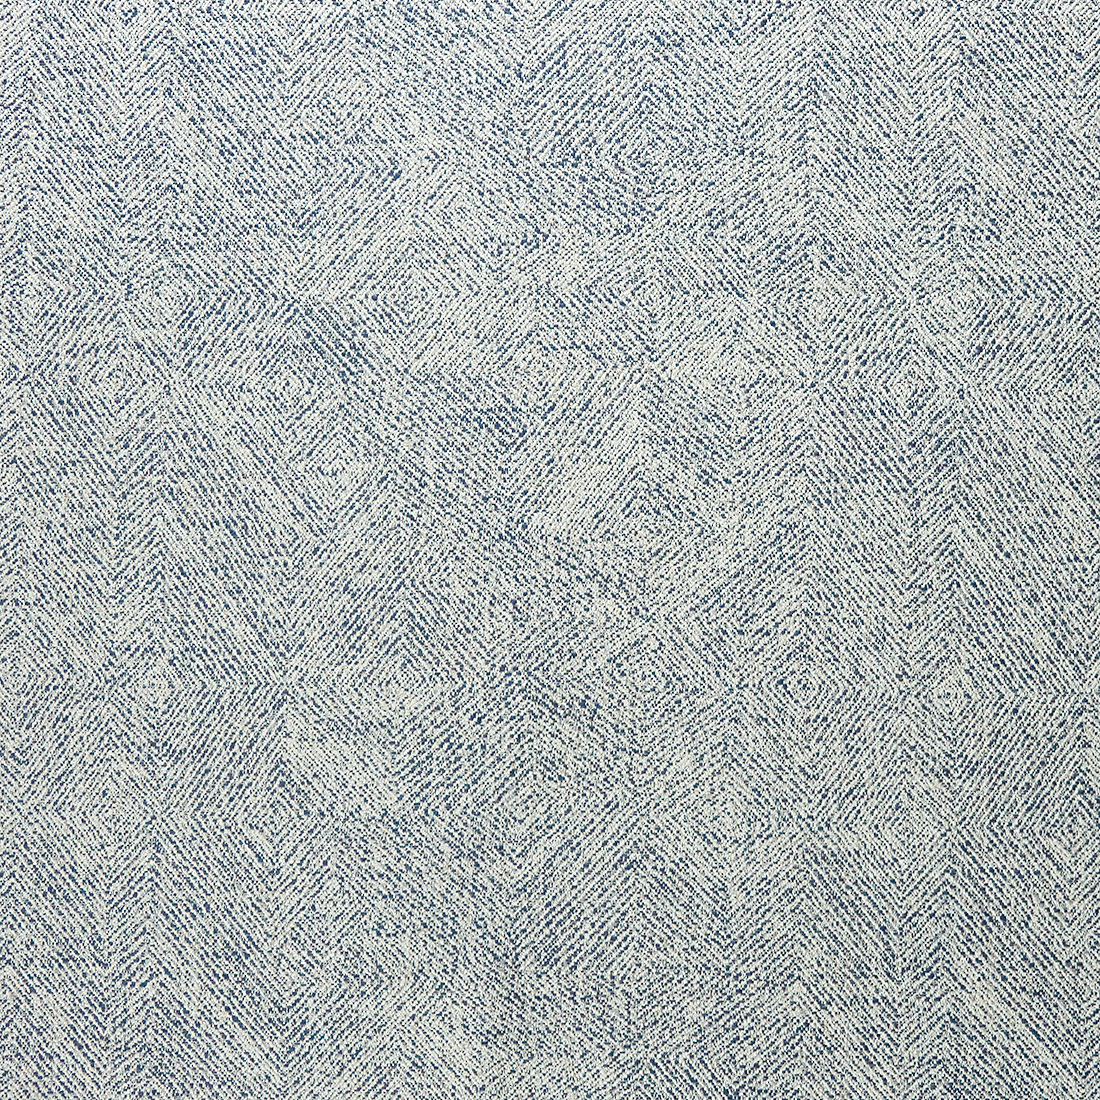 Dania Midnight Upholstery Fabric